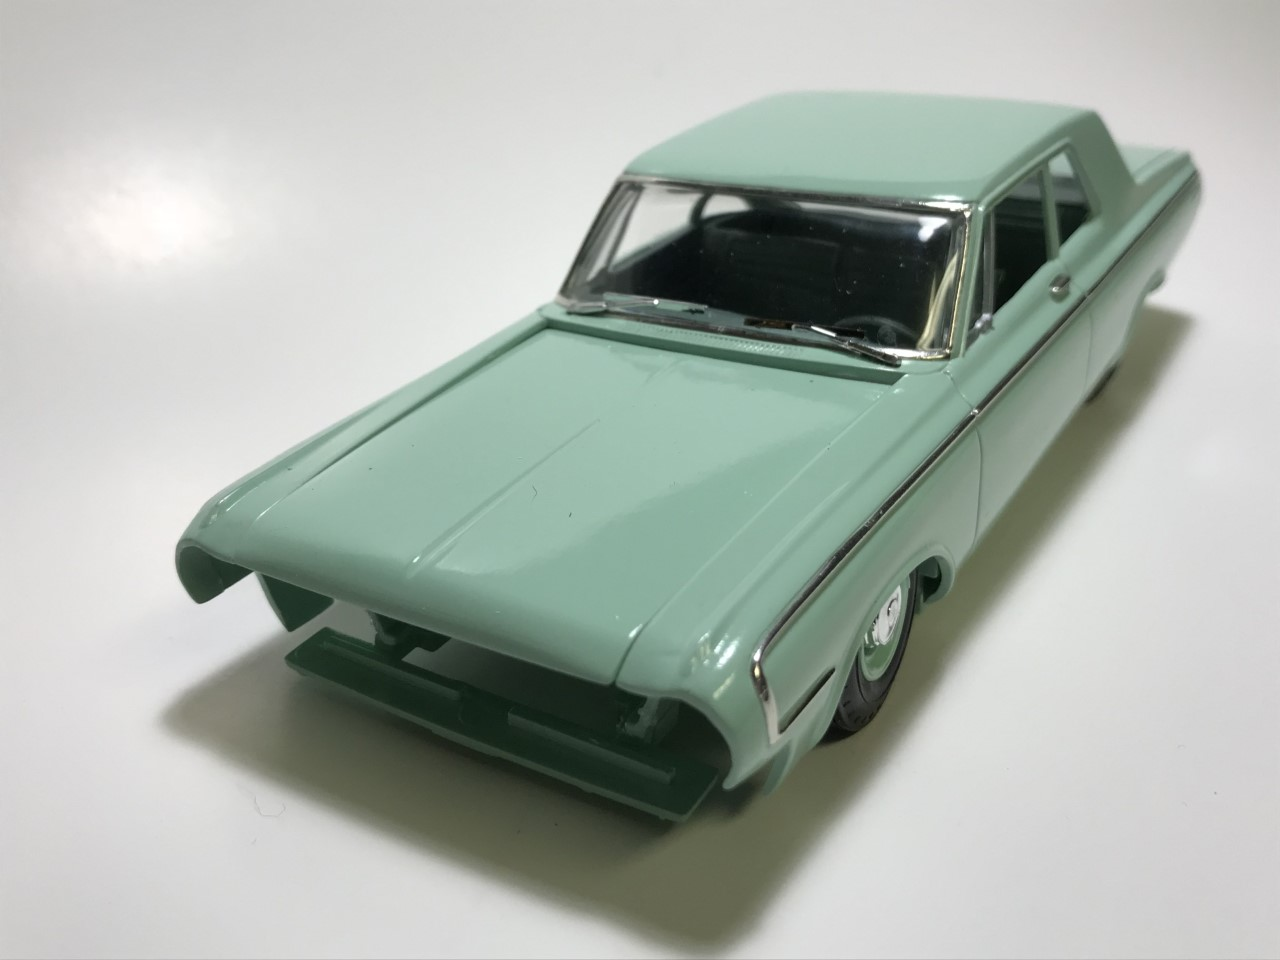 1964 Dodge 330 sedan in progress #5 Feb 5,2018.jpg